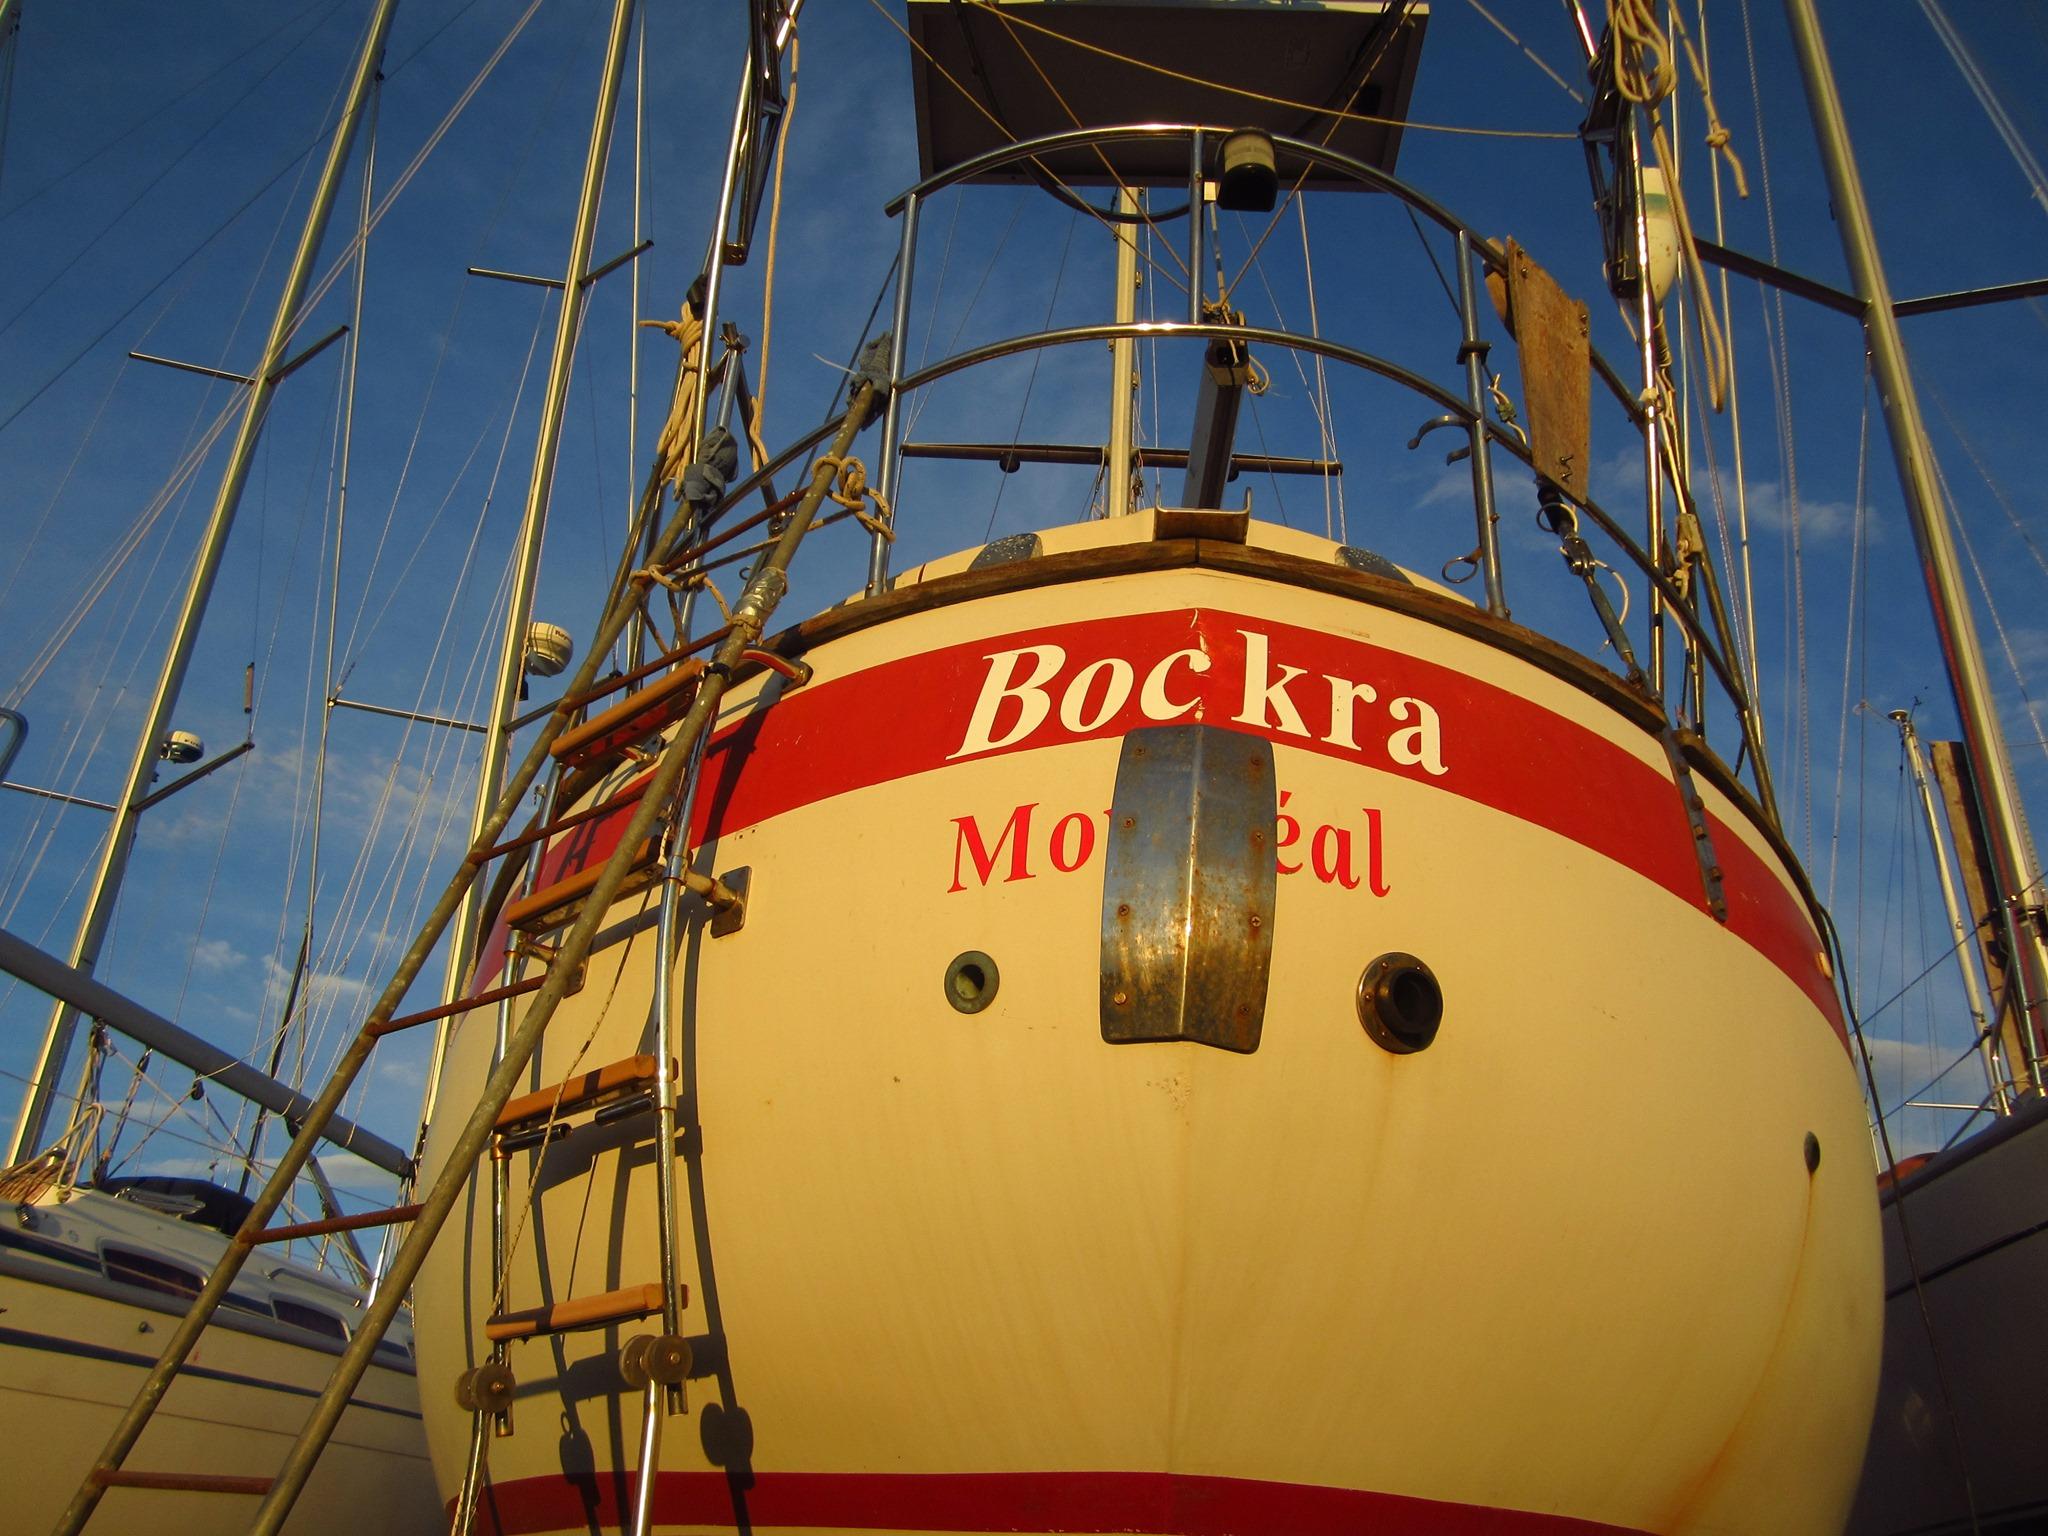 123 - Bockra - stern propped